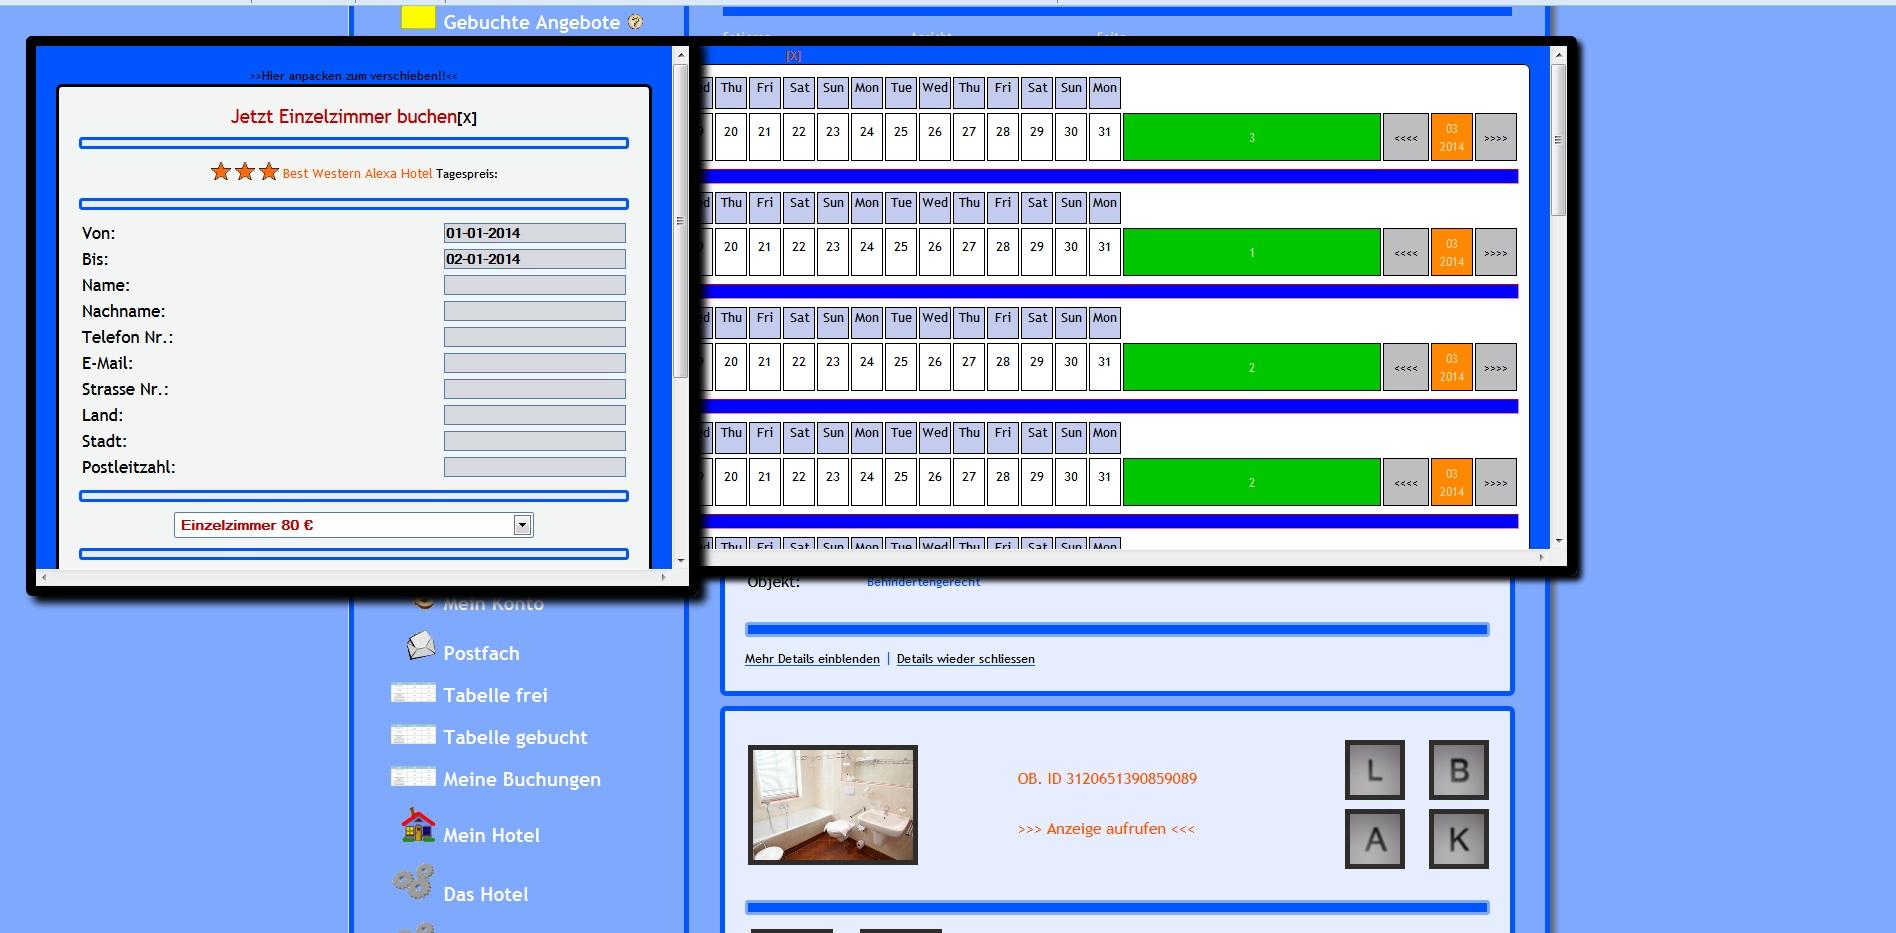 Hotelmanagementsoftware14